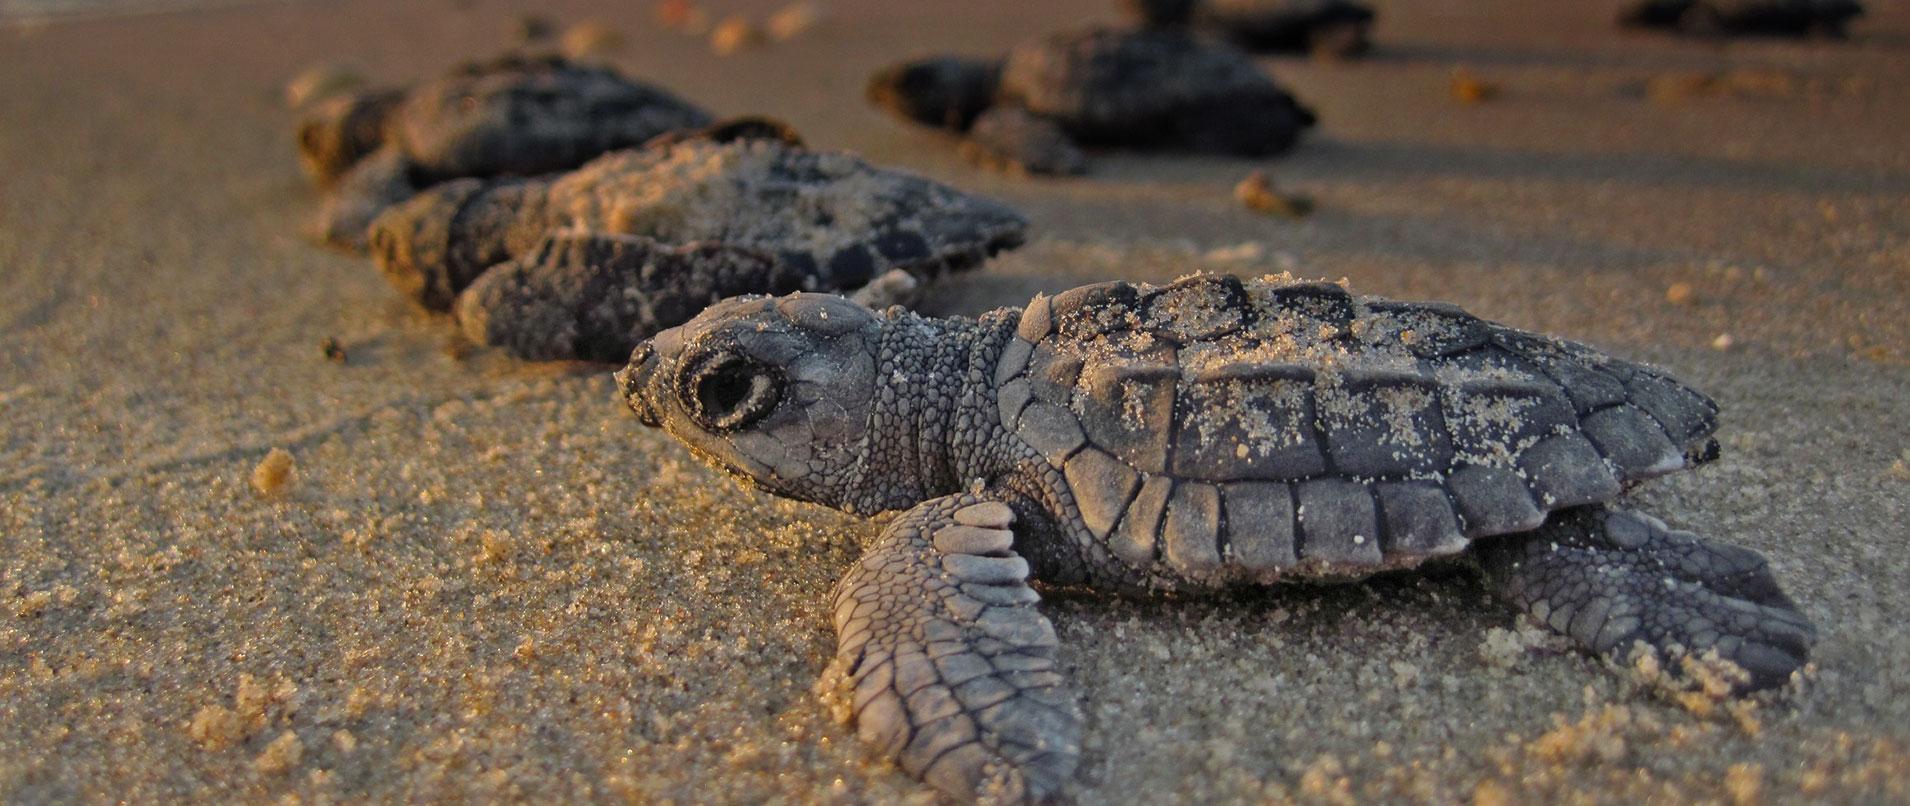 sea turtle internship